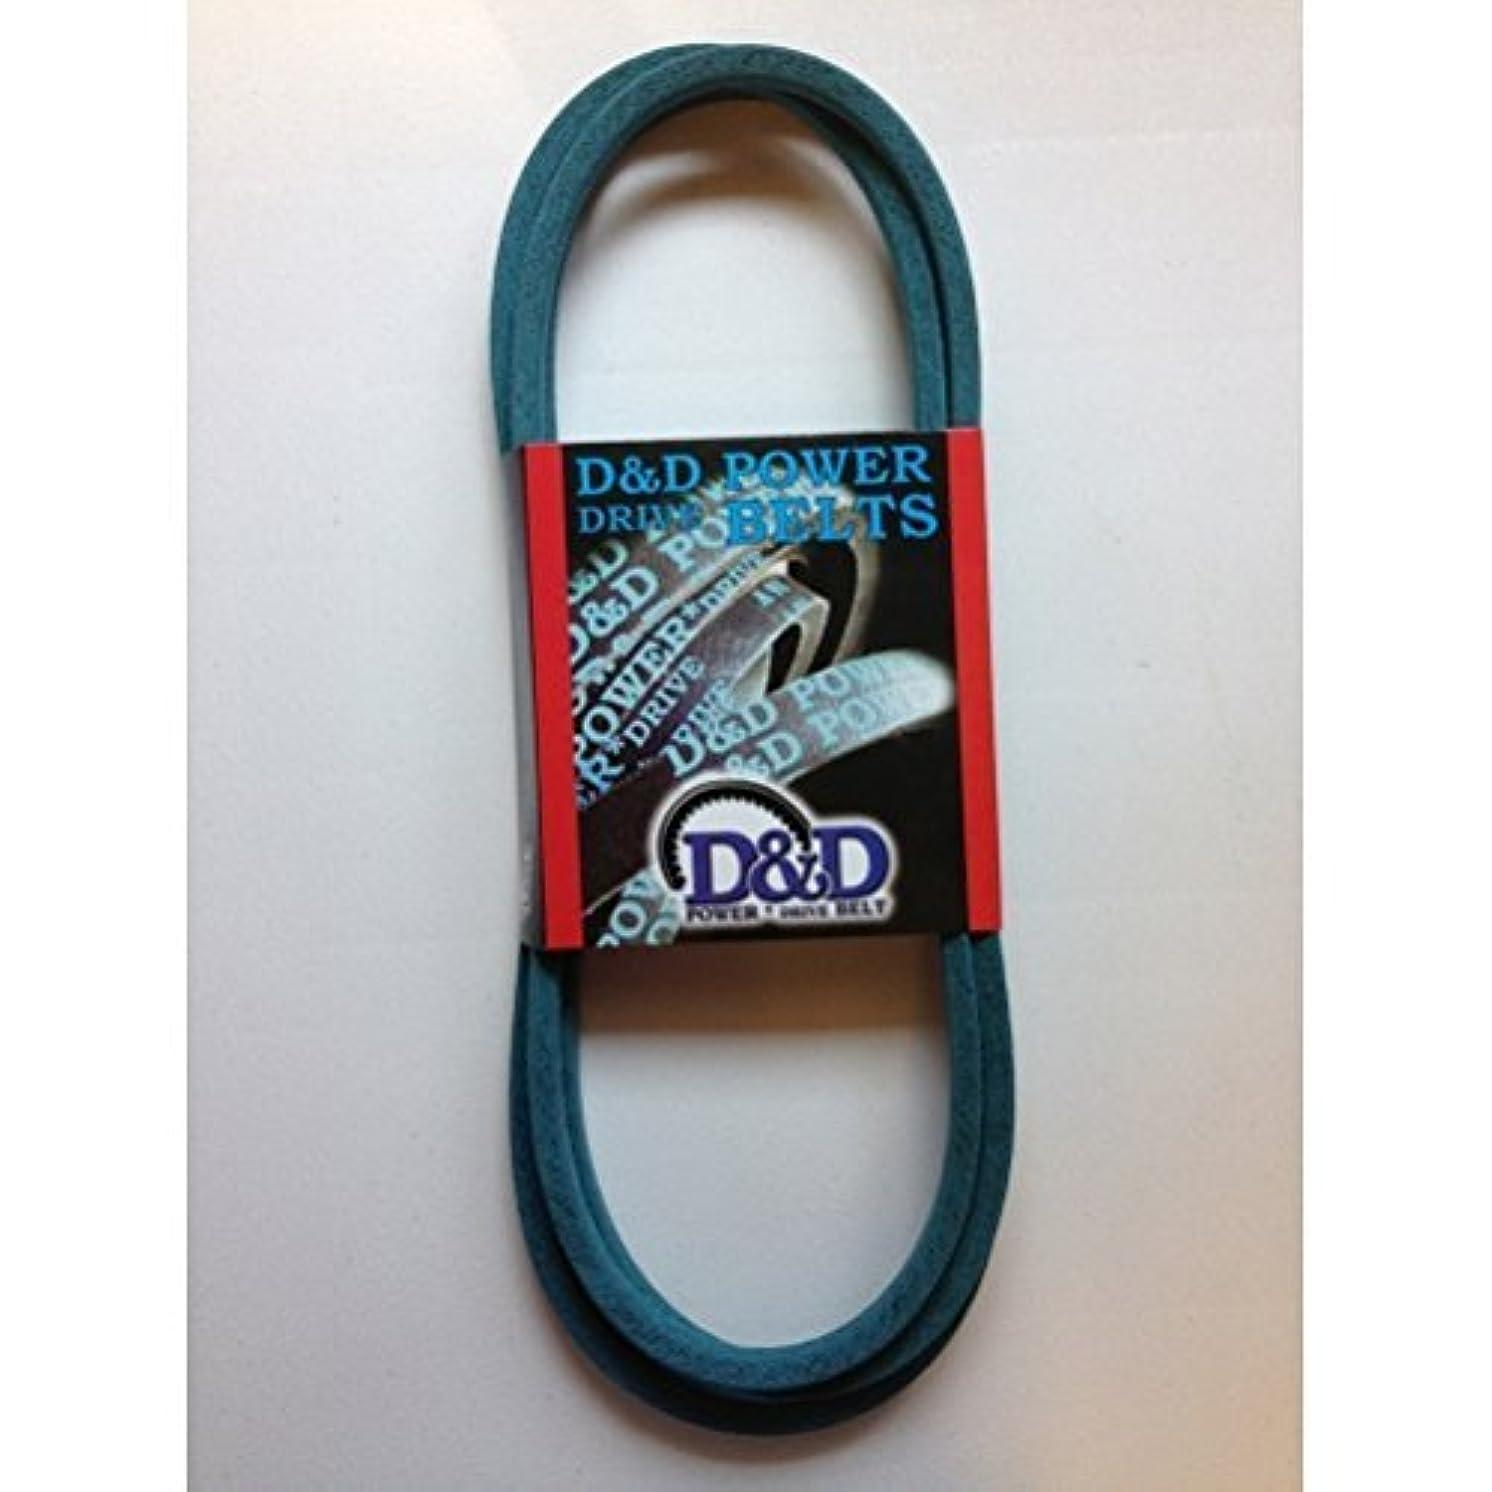 D&D PowerDrive 2721642 Bobcat or RANSOMES Kevlar Replacement Belt, 1 Band, Aramid